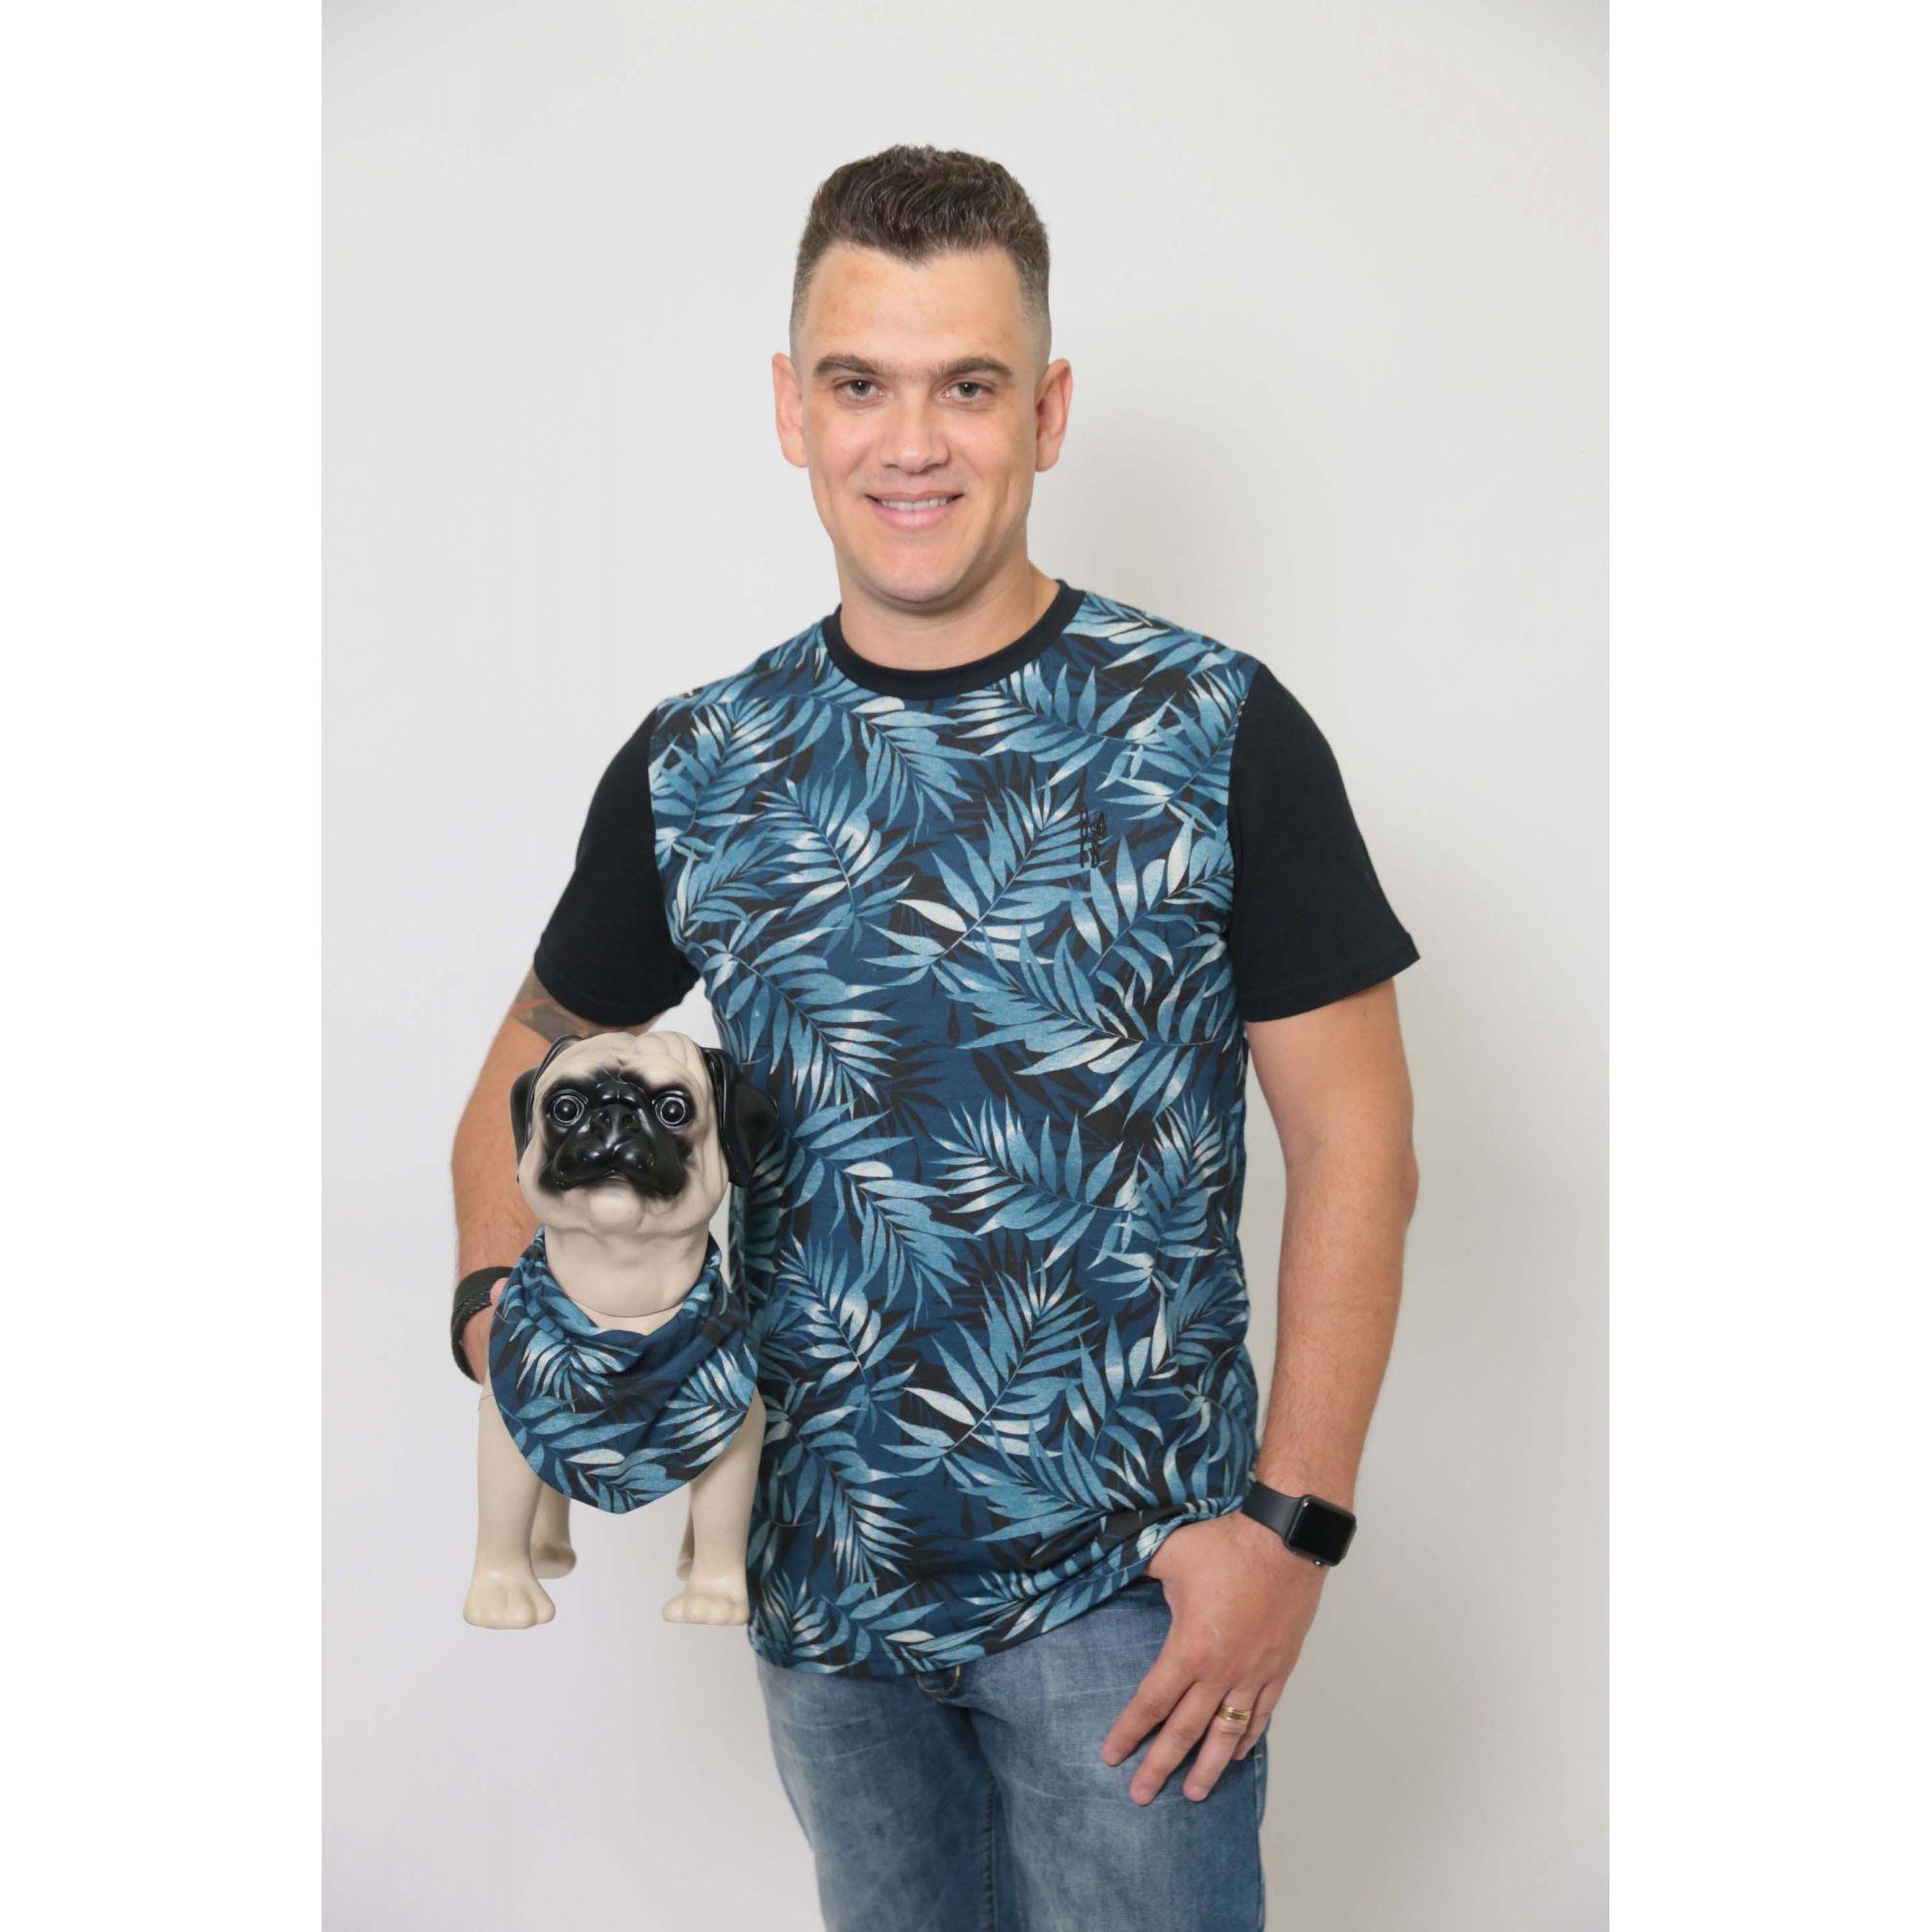 PAI E PET > Kit 02 Peças - T-shirt + Bandana Tropical [Coleção Tal Pai Tal Pet]